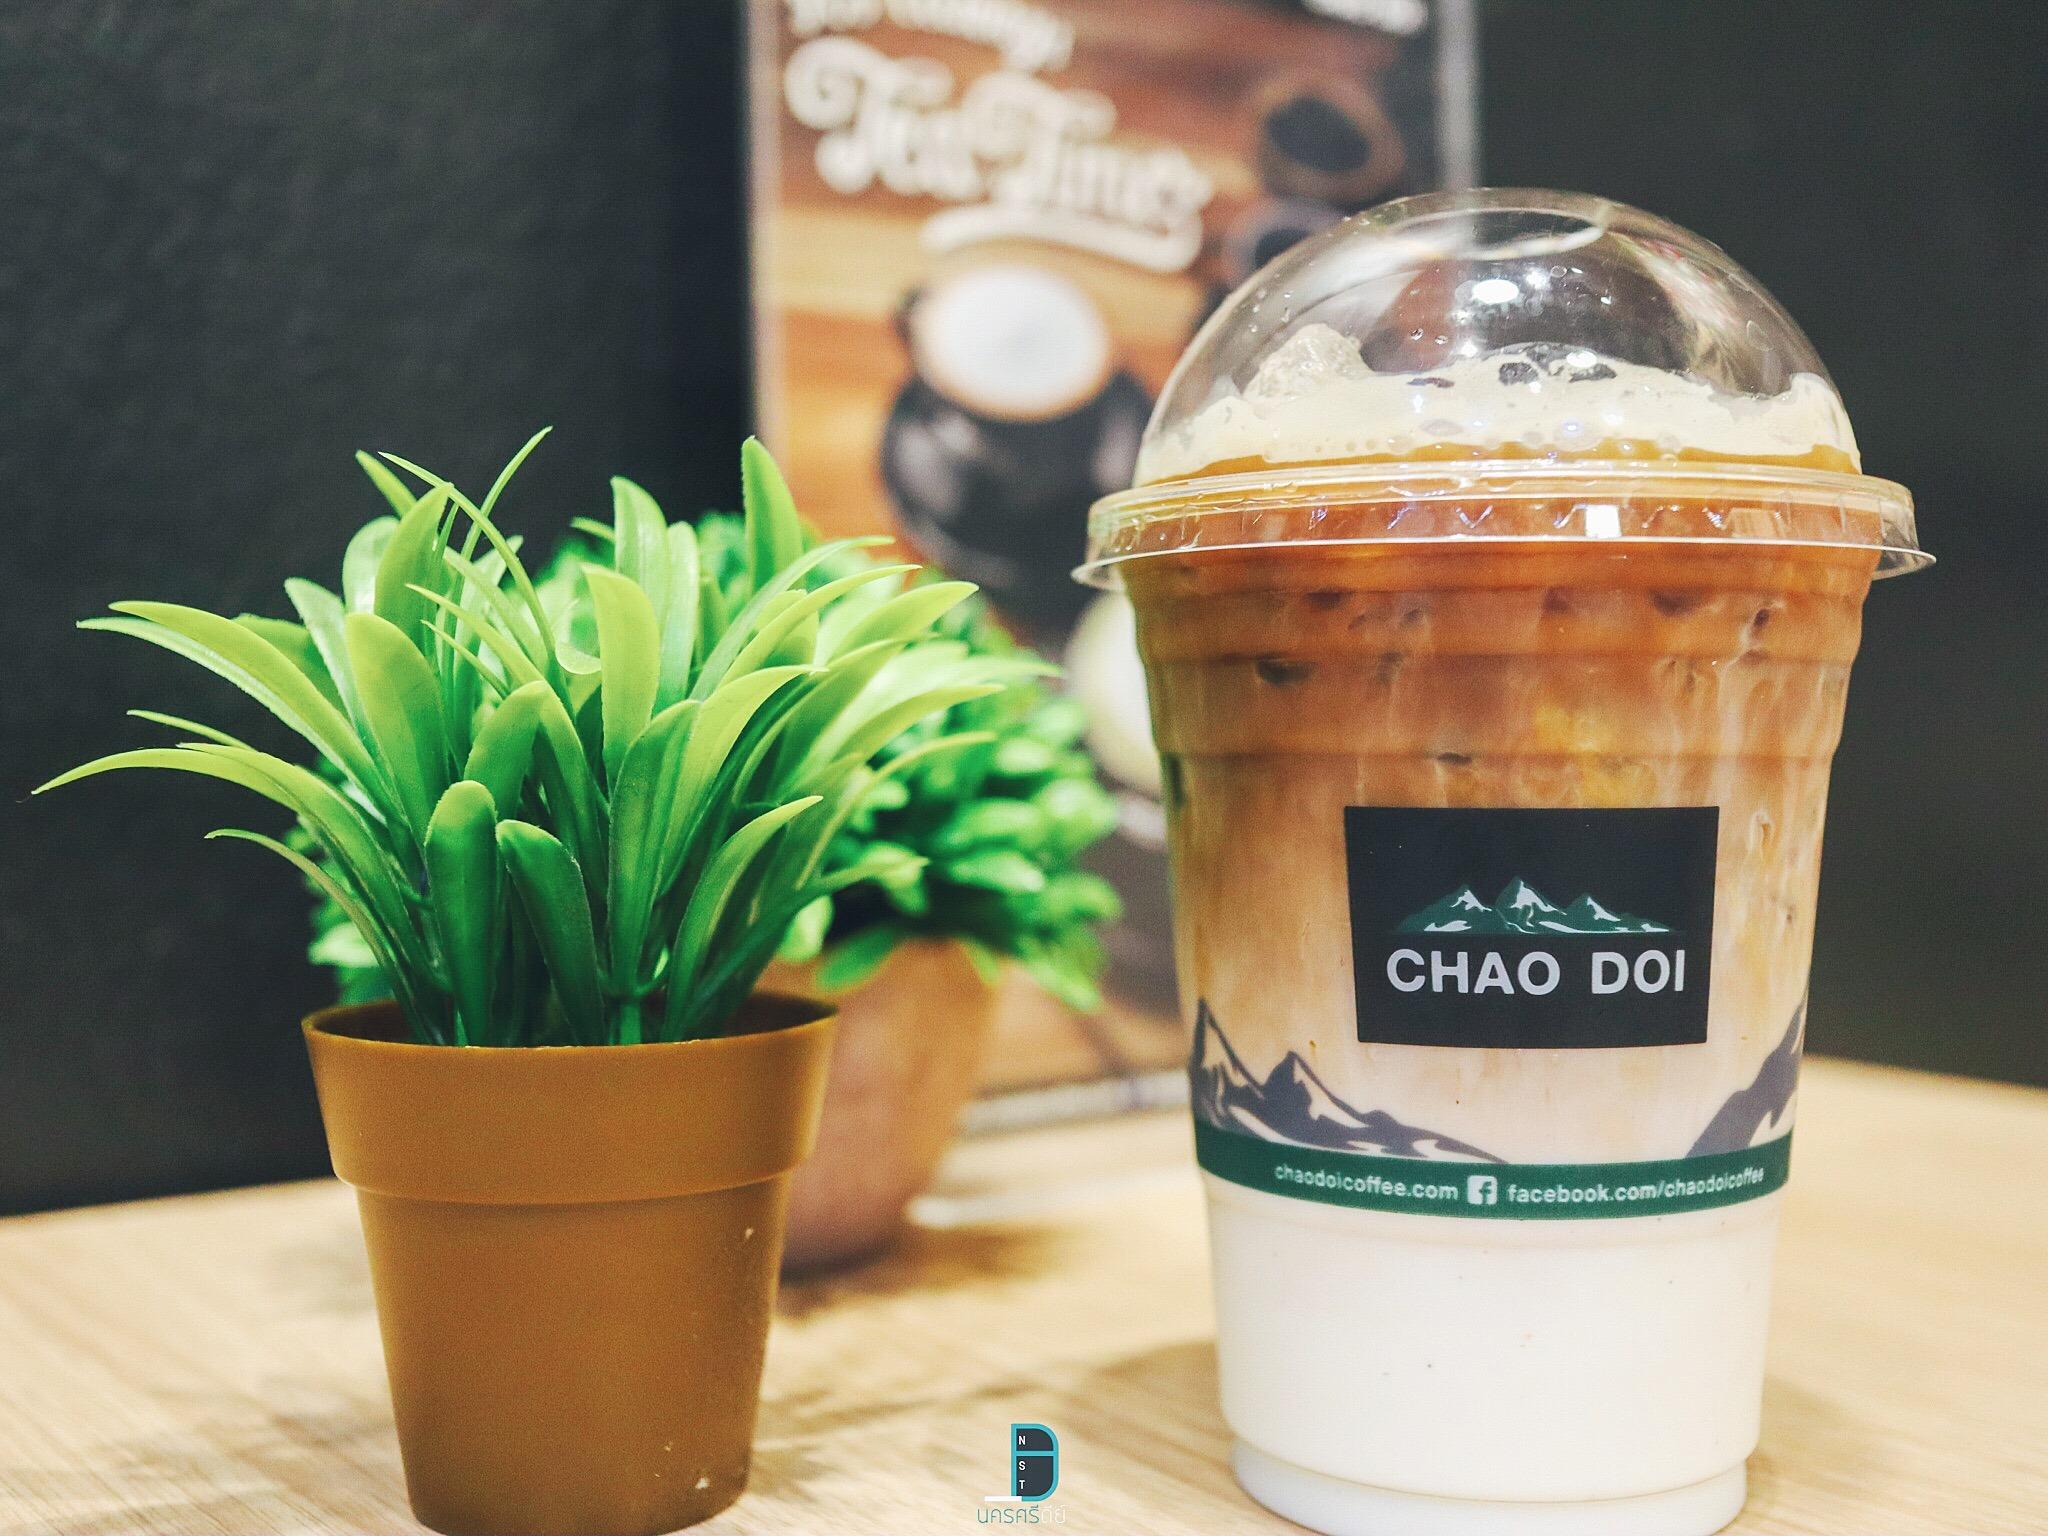 Chao doi นครศรีธรรมราช ร้านกาแฟสวยๆ นั่งสบาย เครื่องดื่มหลากหลายเมนู at ibiz avenue นครศรีดีย์